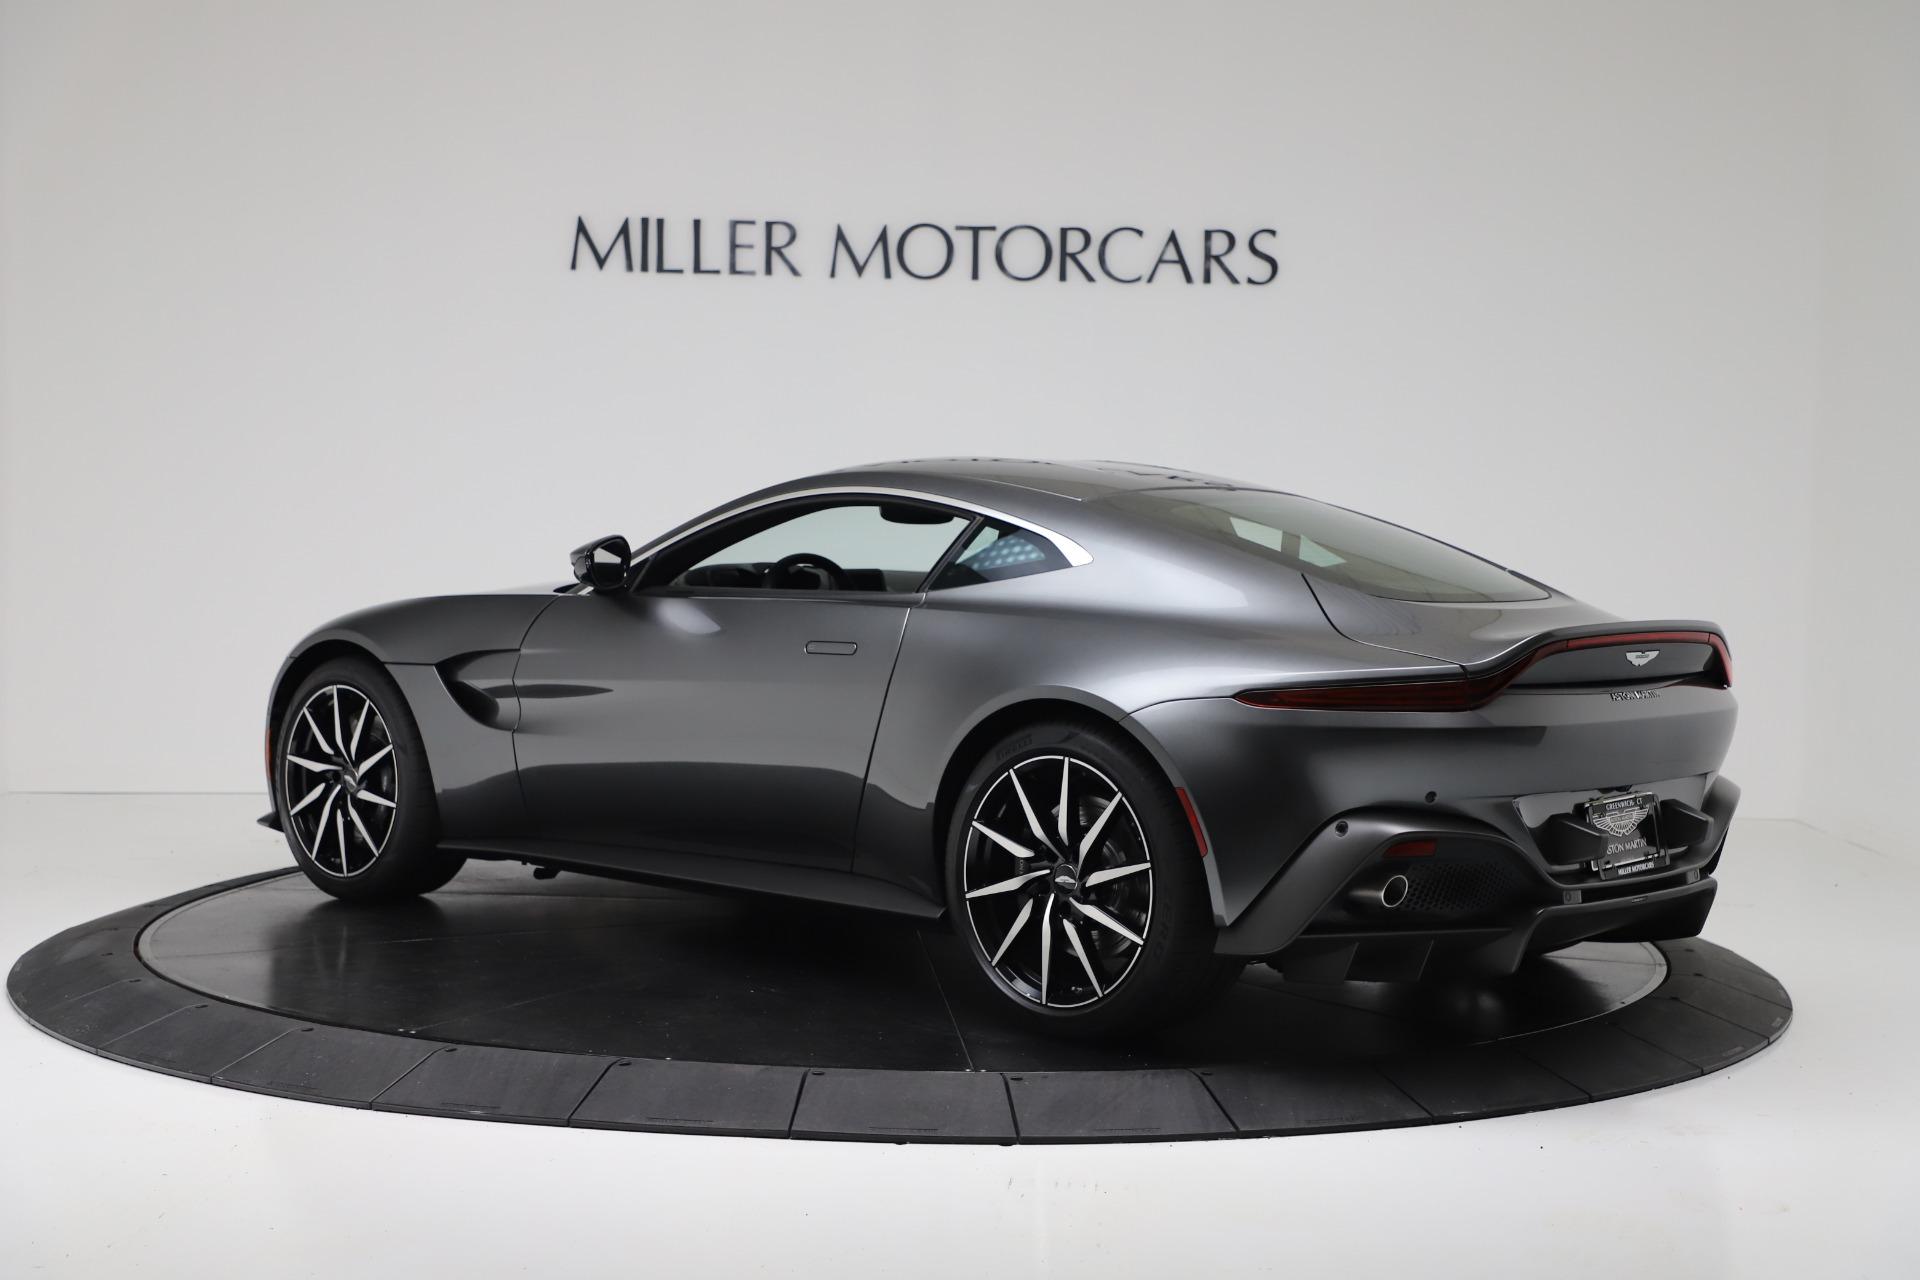 New 2020 Aston Martin Vantage V8 For Sale In Greenwich, CT 3384_p3